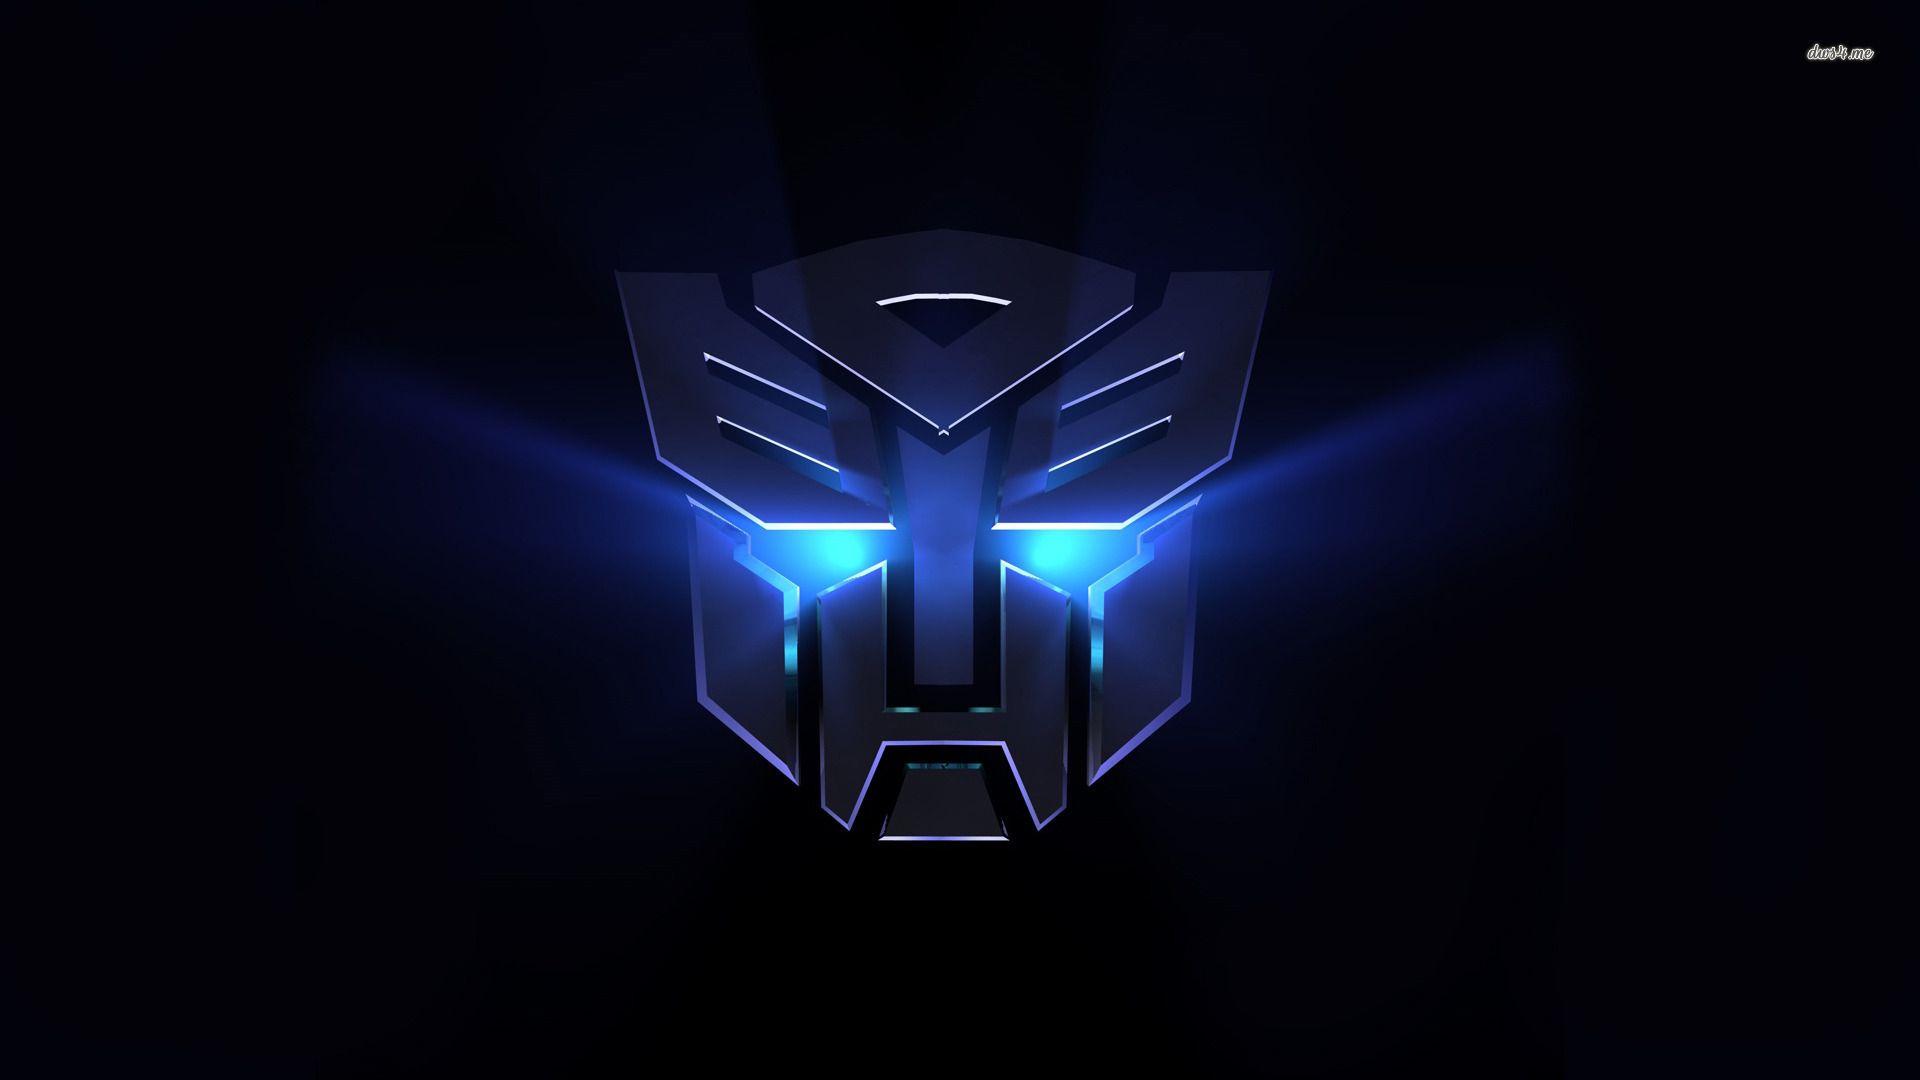 EpicMusicVn Wallpaper Transformer logo Autobots logo 1920x1080